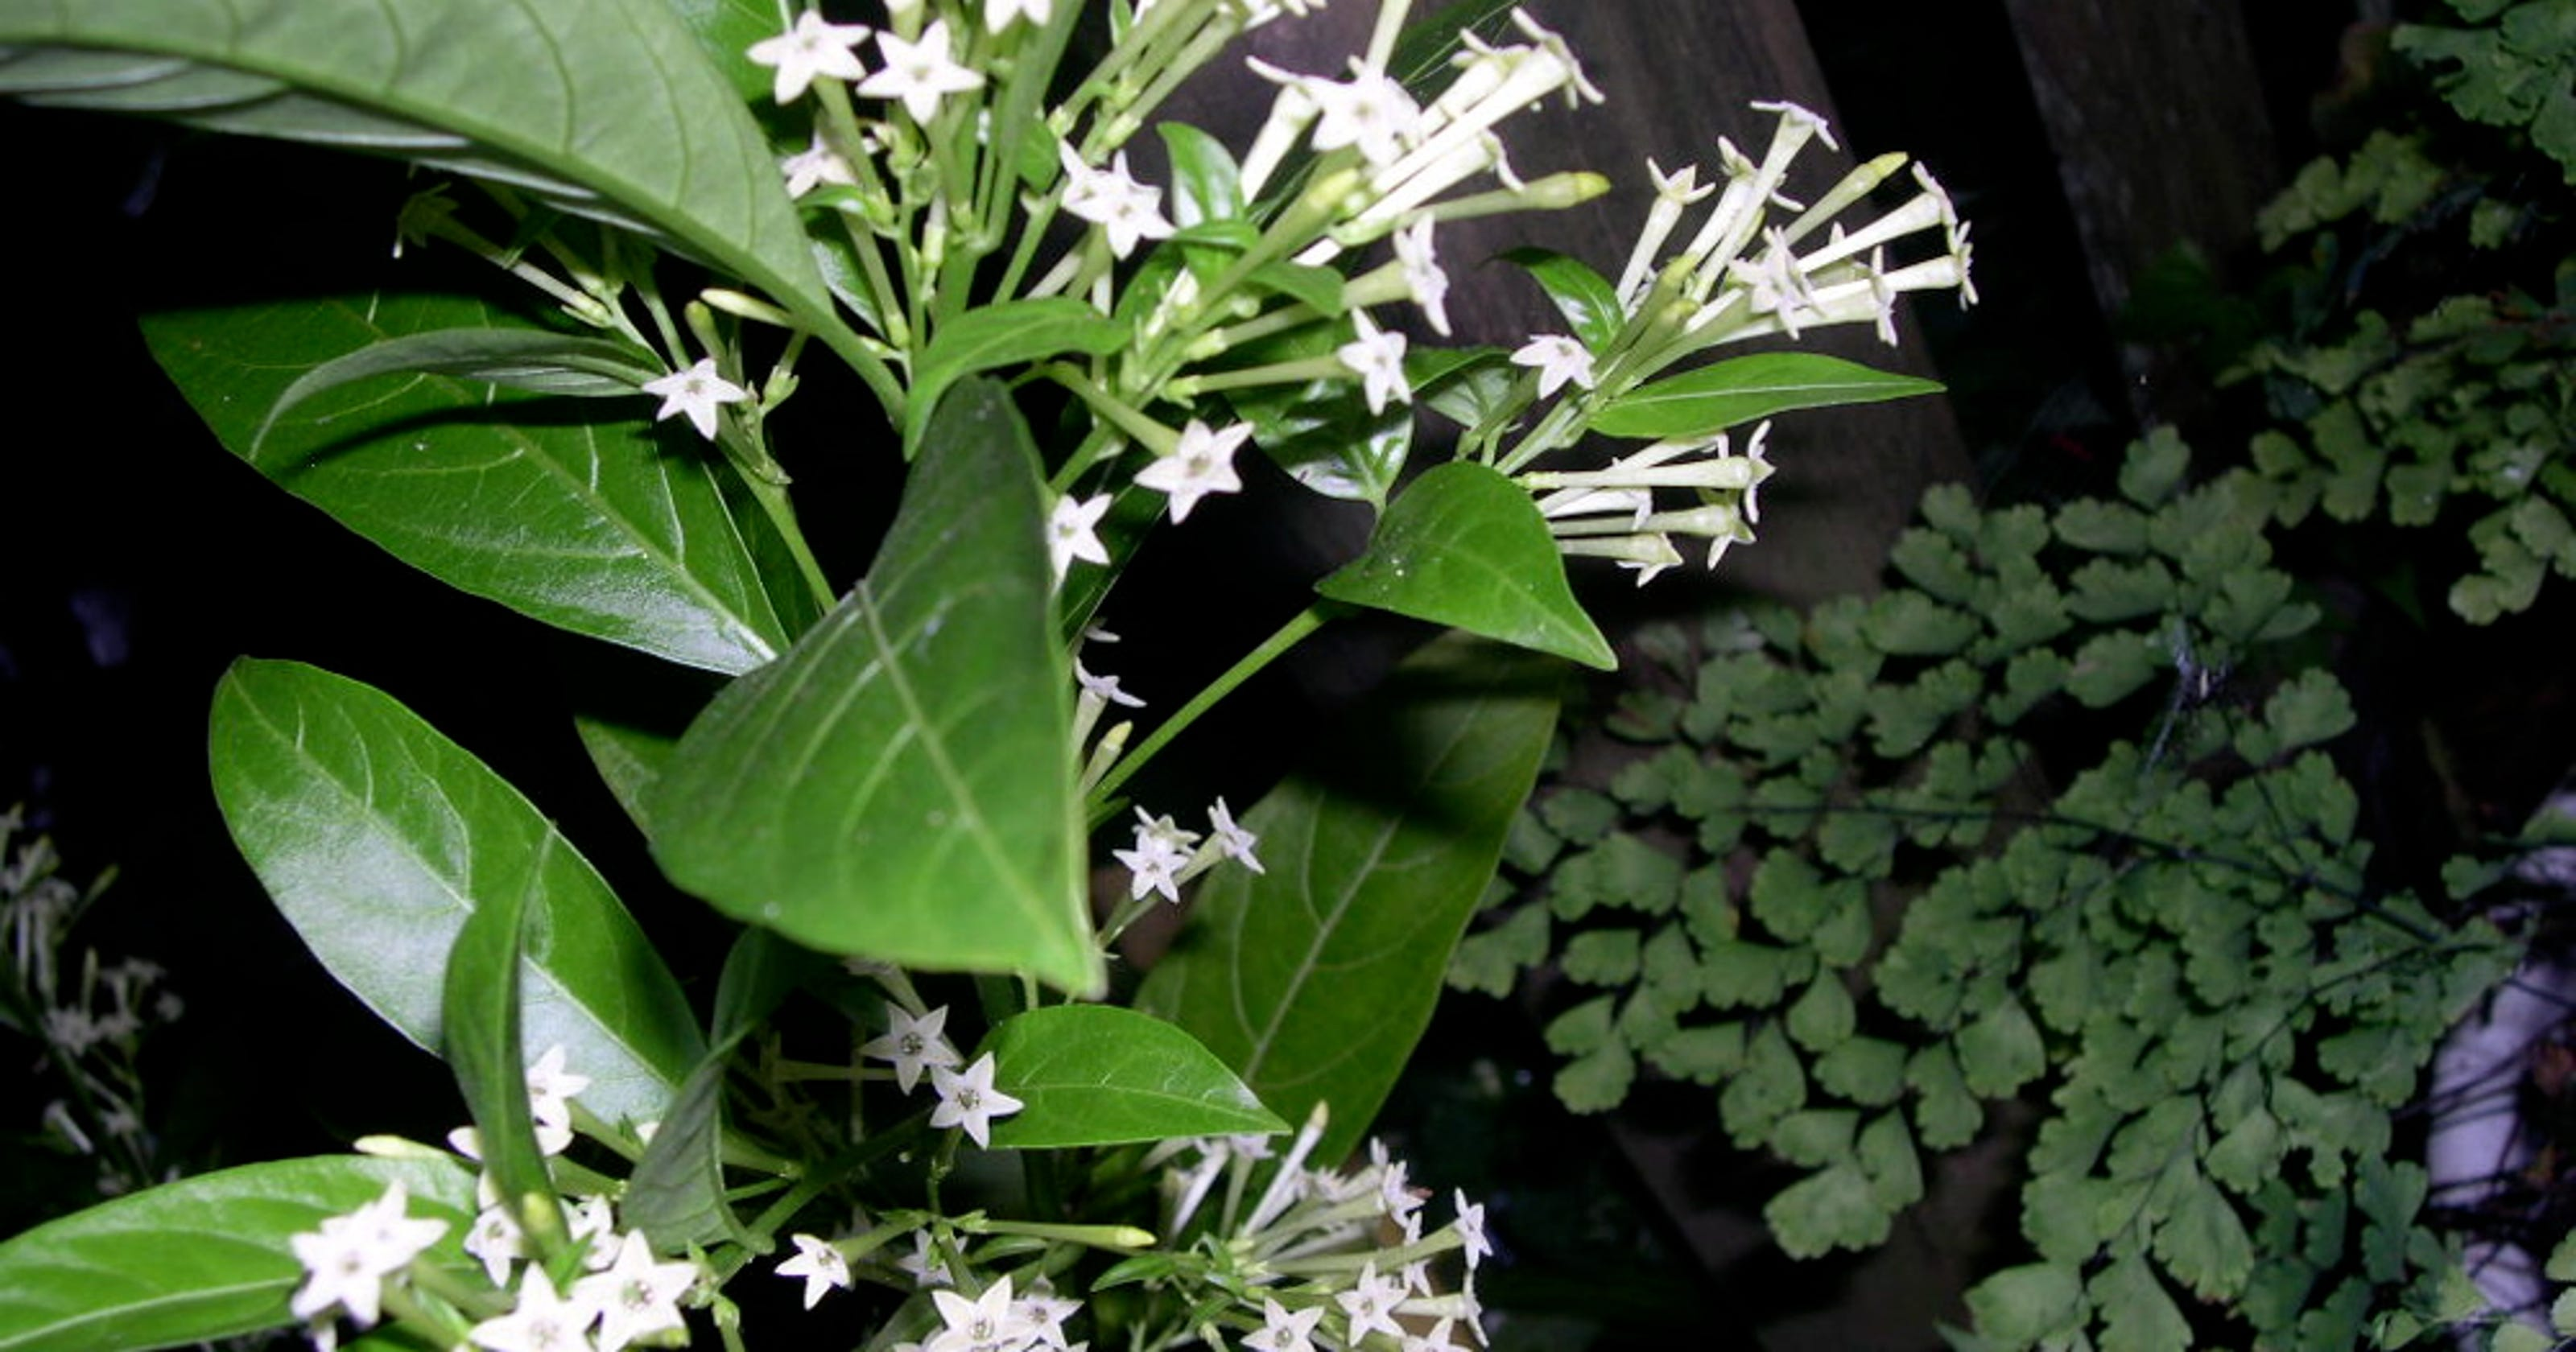 Fragrant plants add wonderful scents in late summer izmirmasajfo